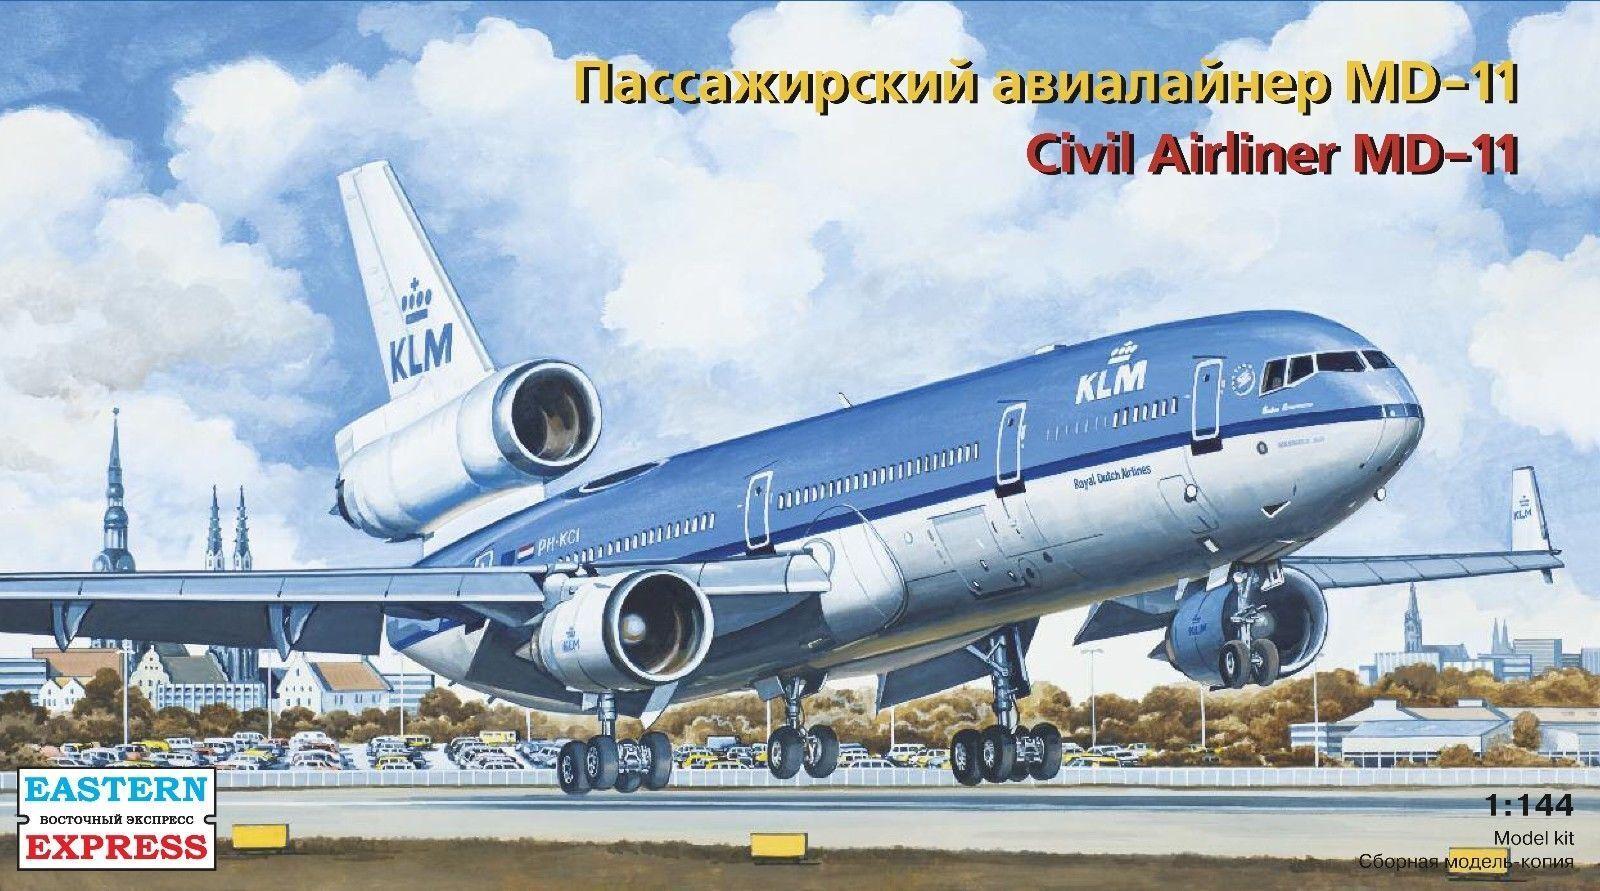 Eastern Express –144102 –McDonnell Douglas MD -11 KLM - 1 144